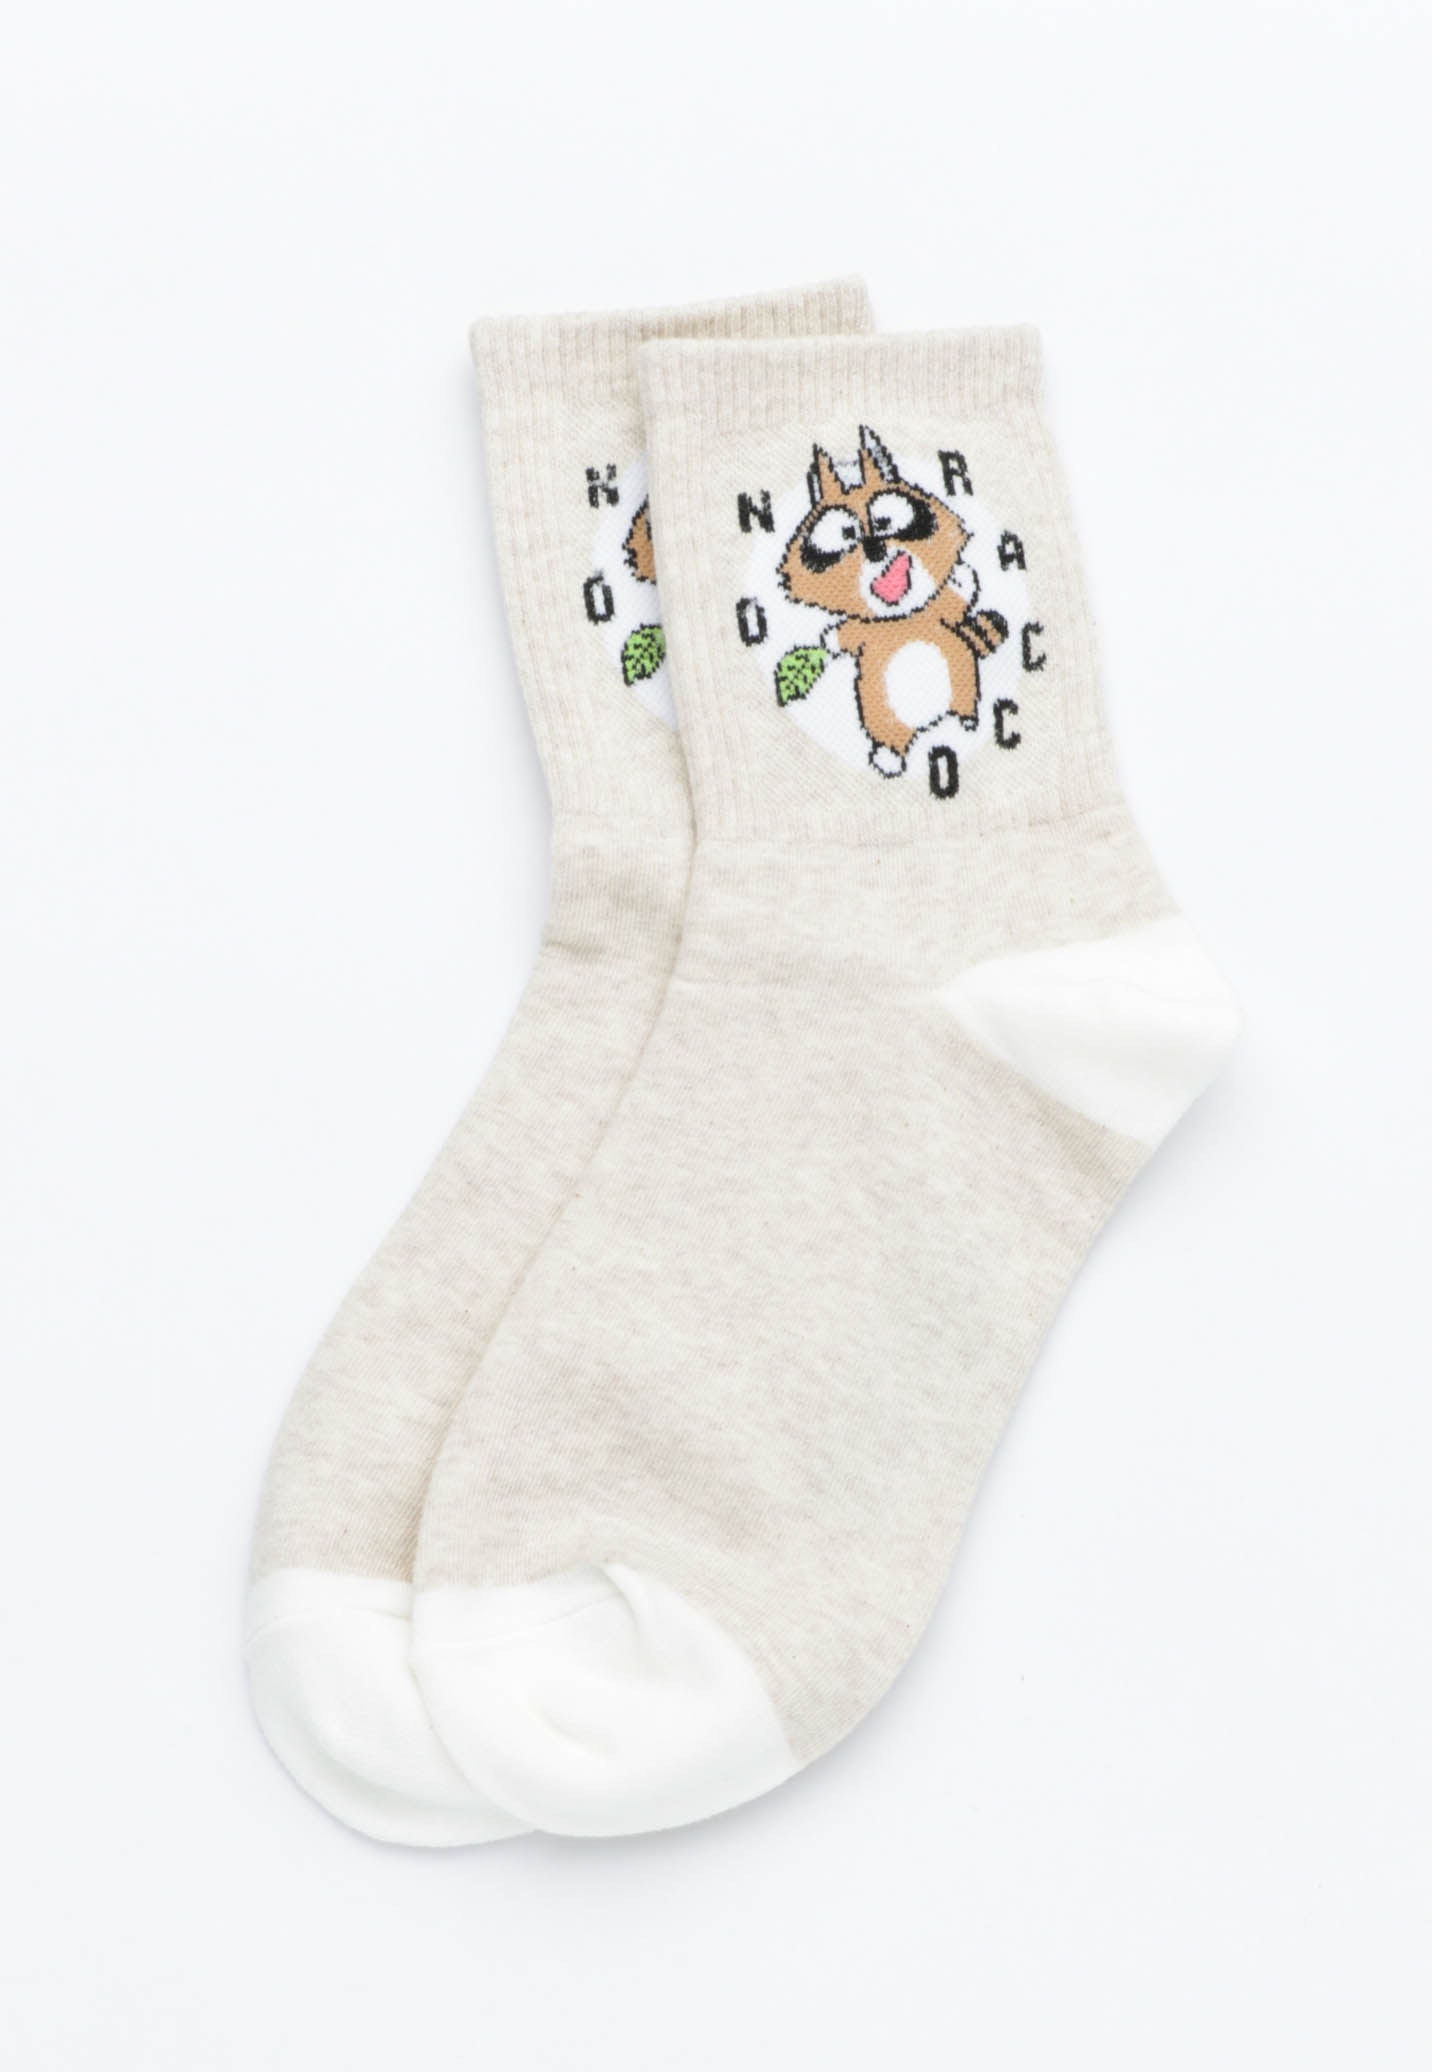 Dancing Raccoon Socks - Oatmeal